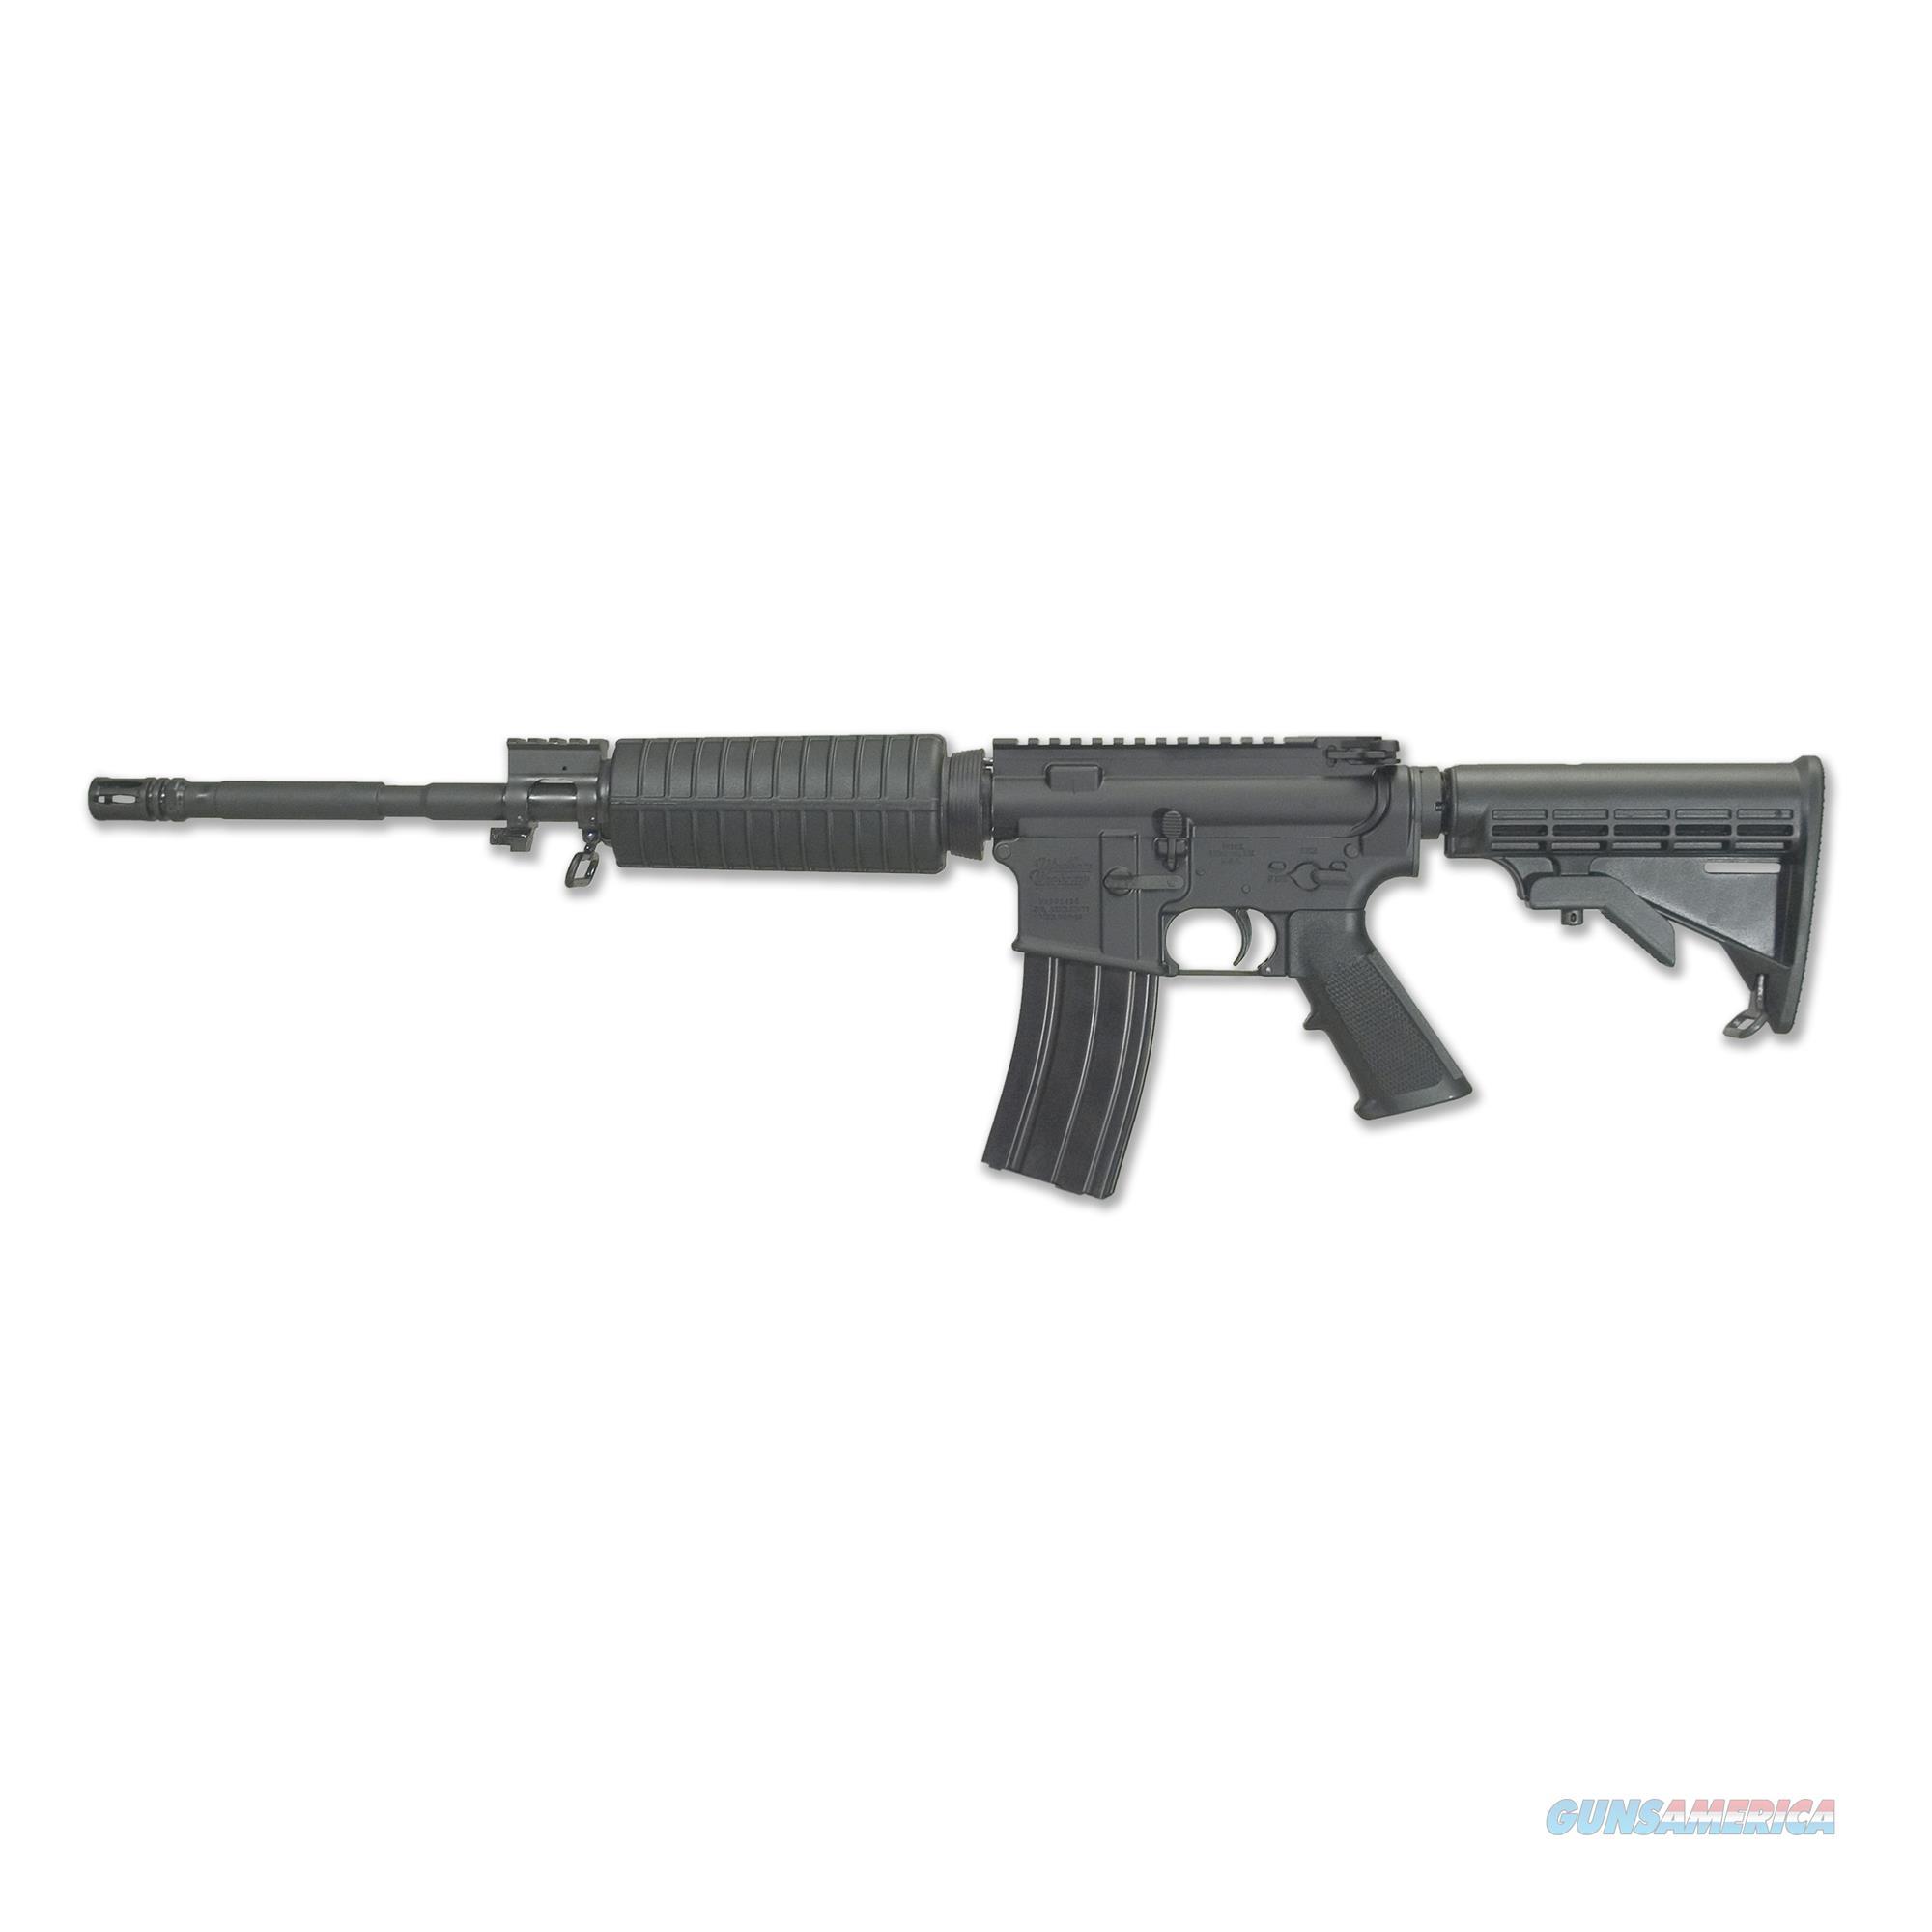 "Windham SRC .223/5.56 16"" 30+1 - New in Box  Guns > Rifles > Windham Weaponry Rifles"